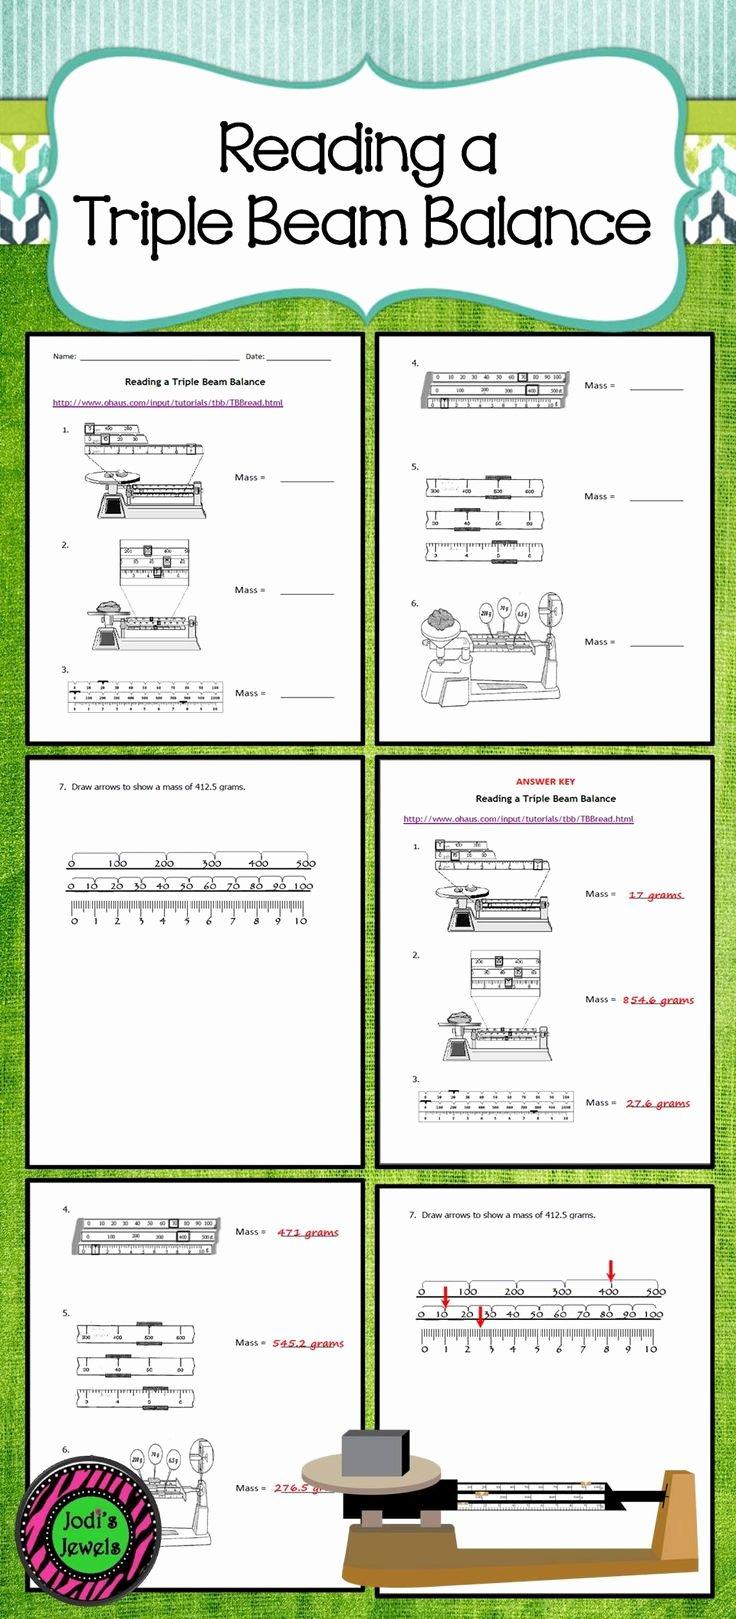 Triple Beam Balance Practice Worksheet Awesome Reading Triple Beam Balance Practice Worksheets